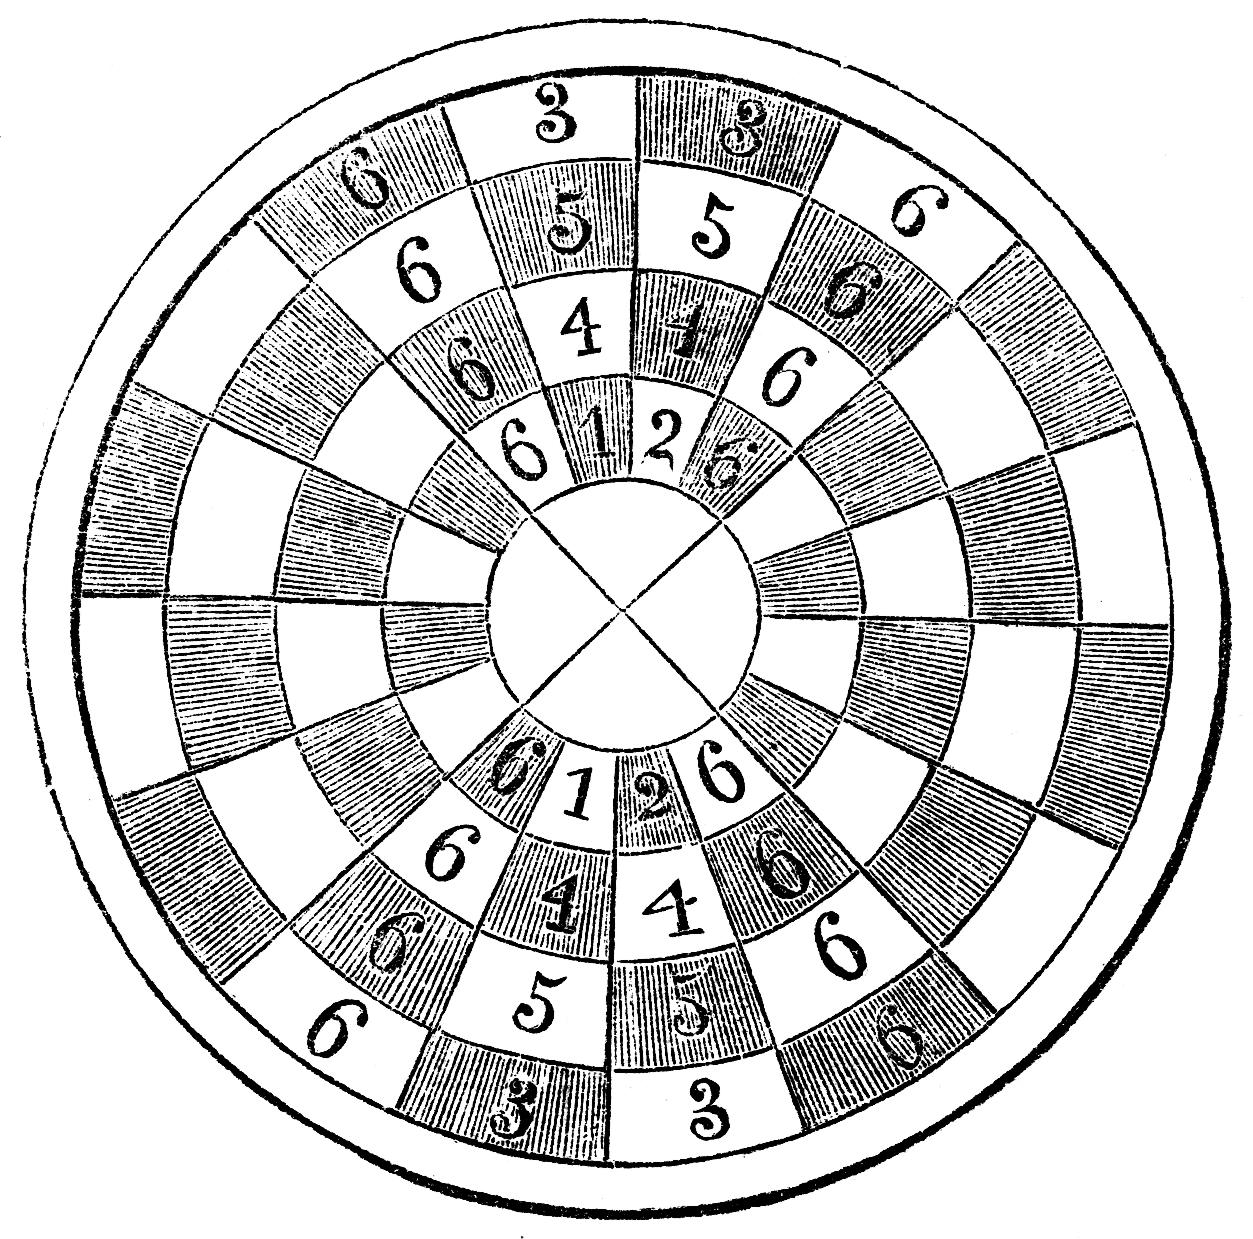 Chess Board Measurements